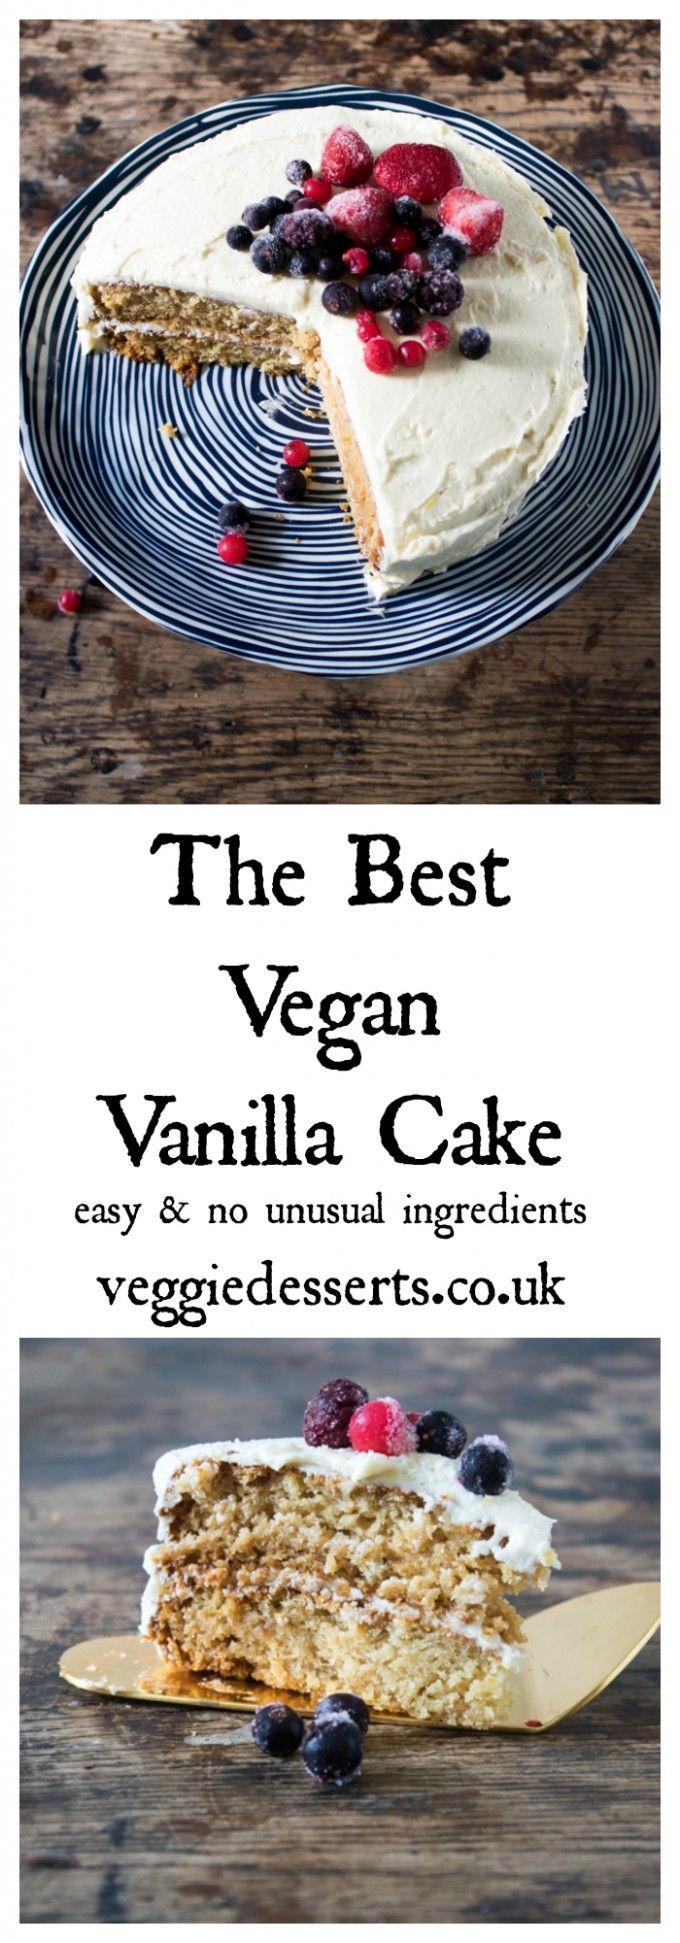 The Best Vegan Vanilla Cake with Berries